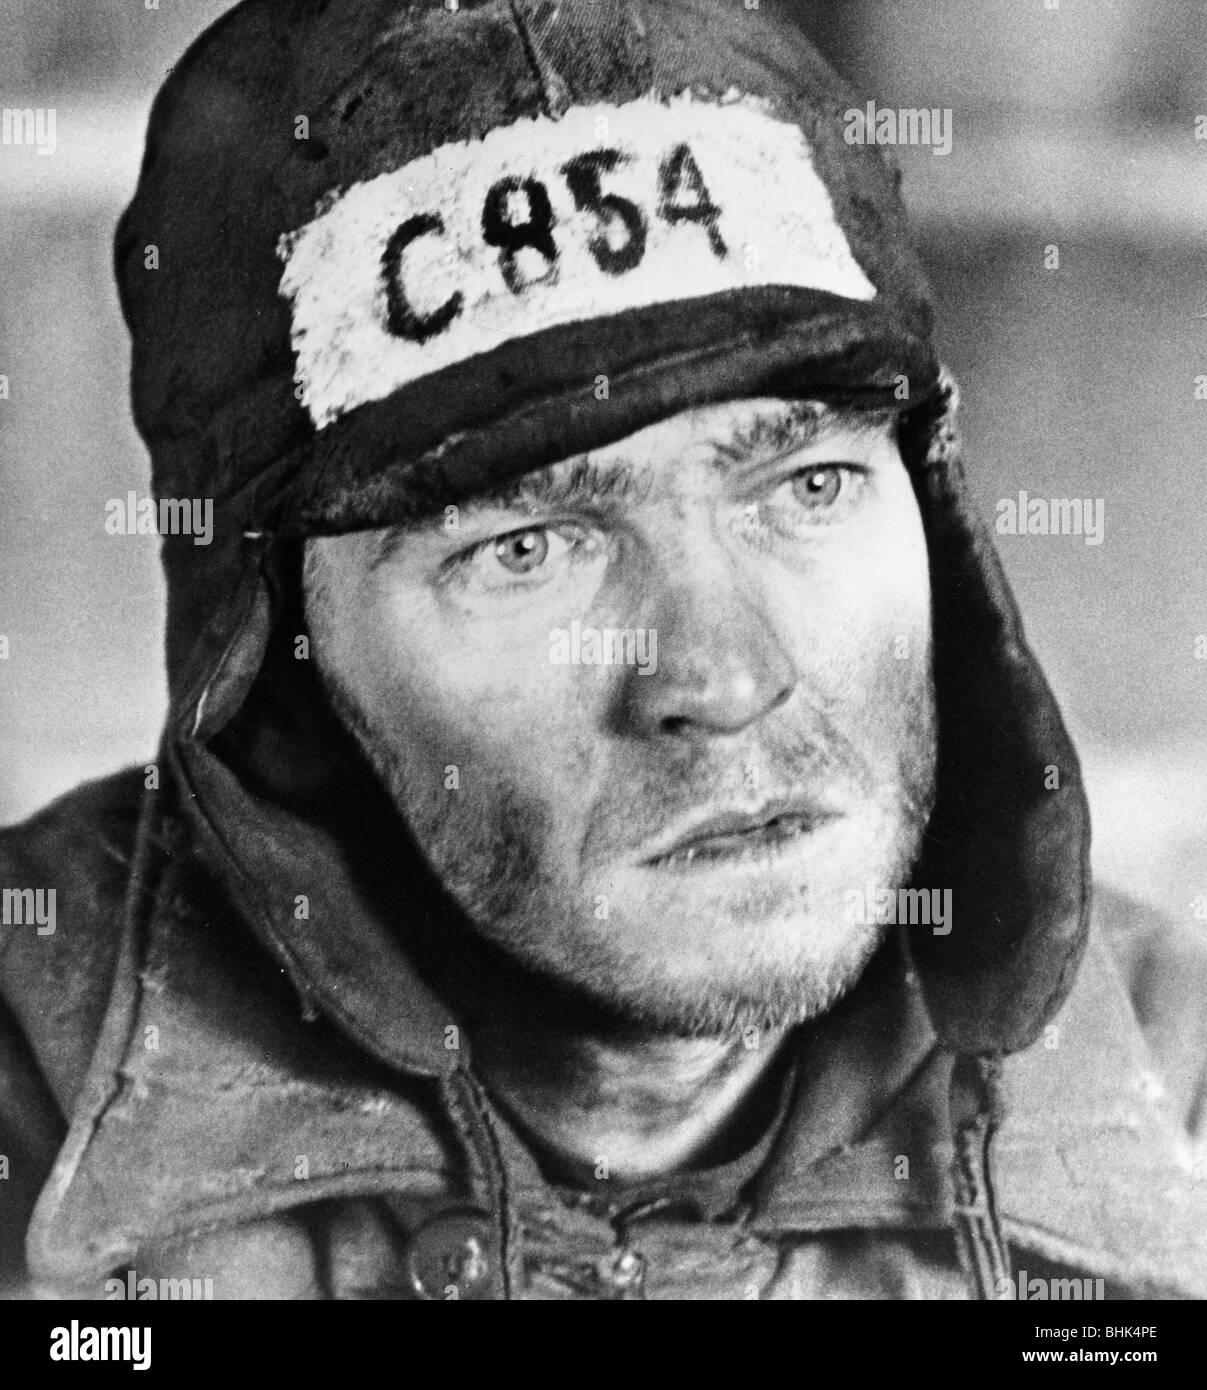 Tom Courtenay (1937- ), British actor, 1972. Stock Photo